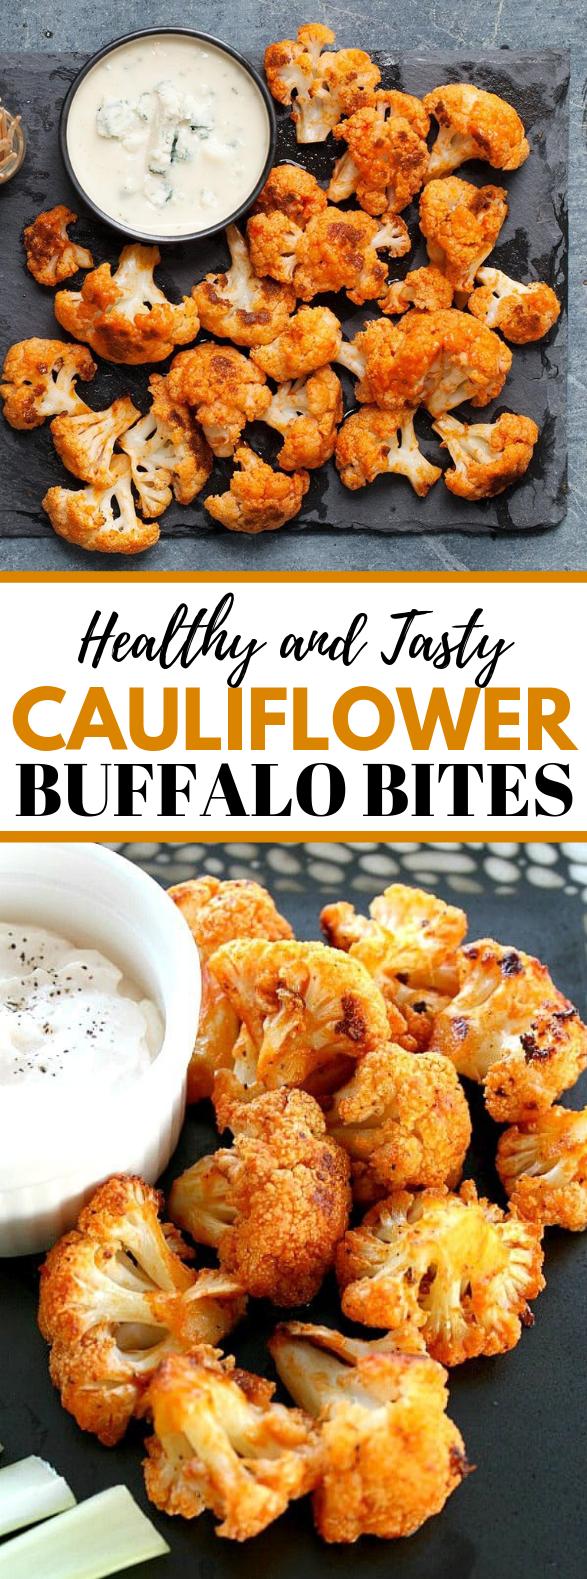 CAULIFLOWER BUFFALO BITES #healthydiet #appetizers